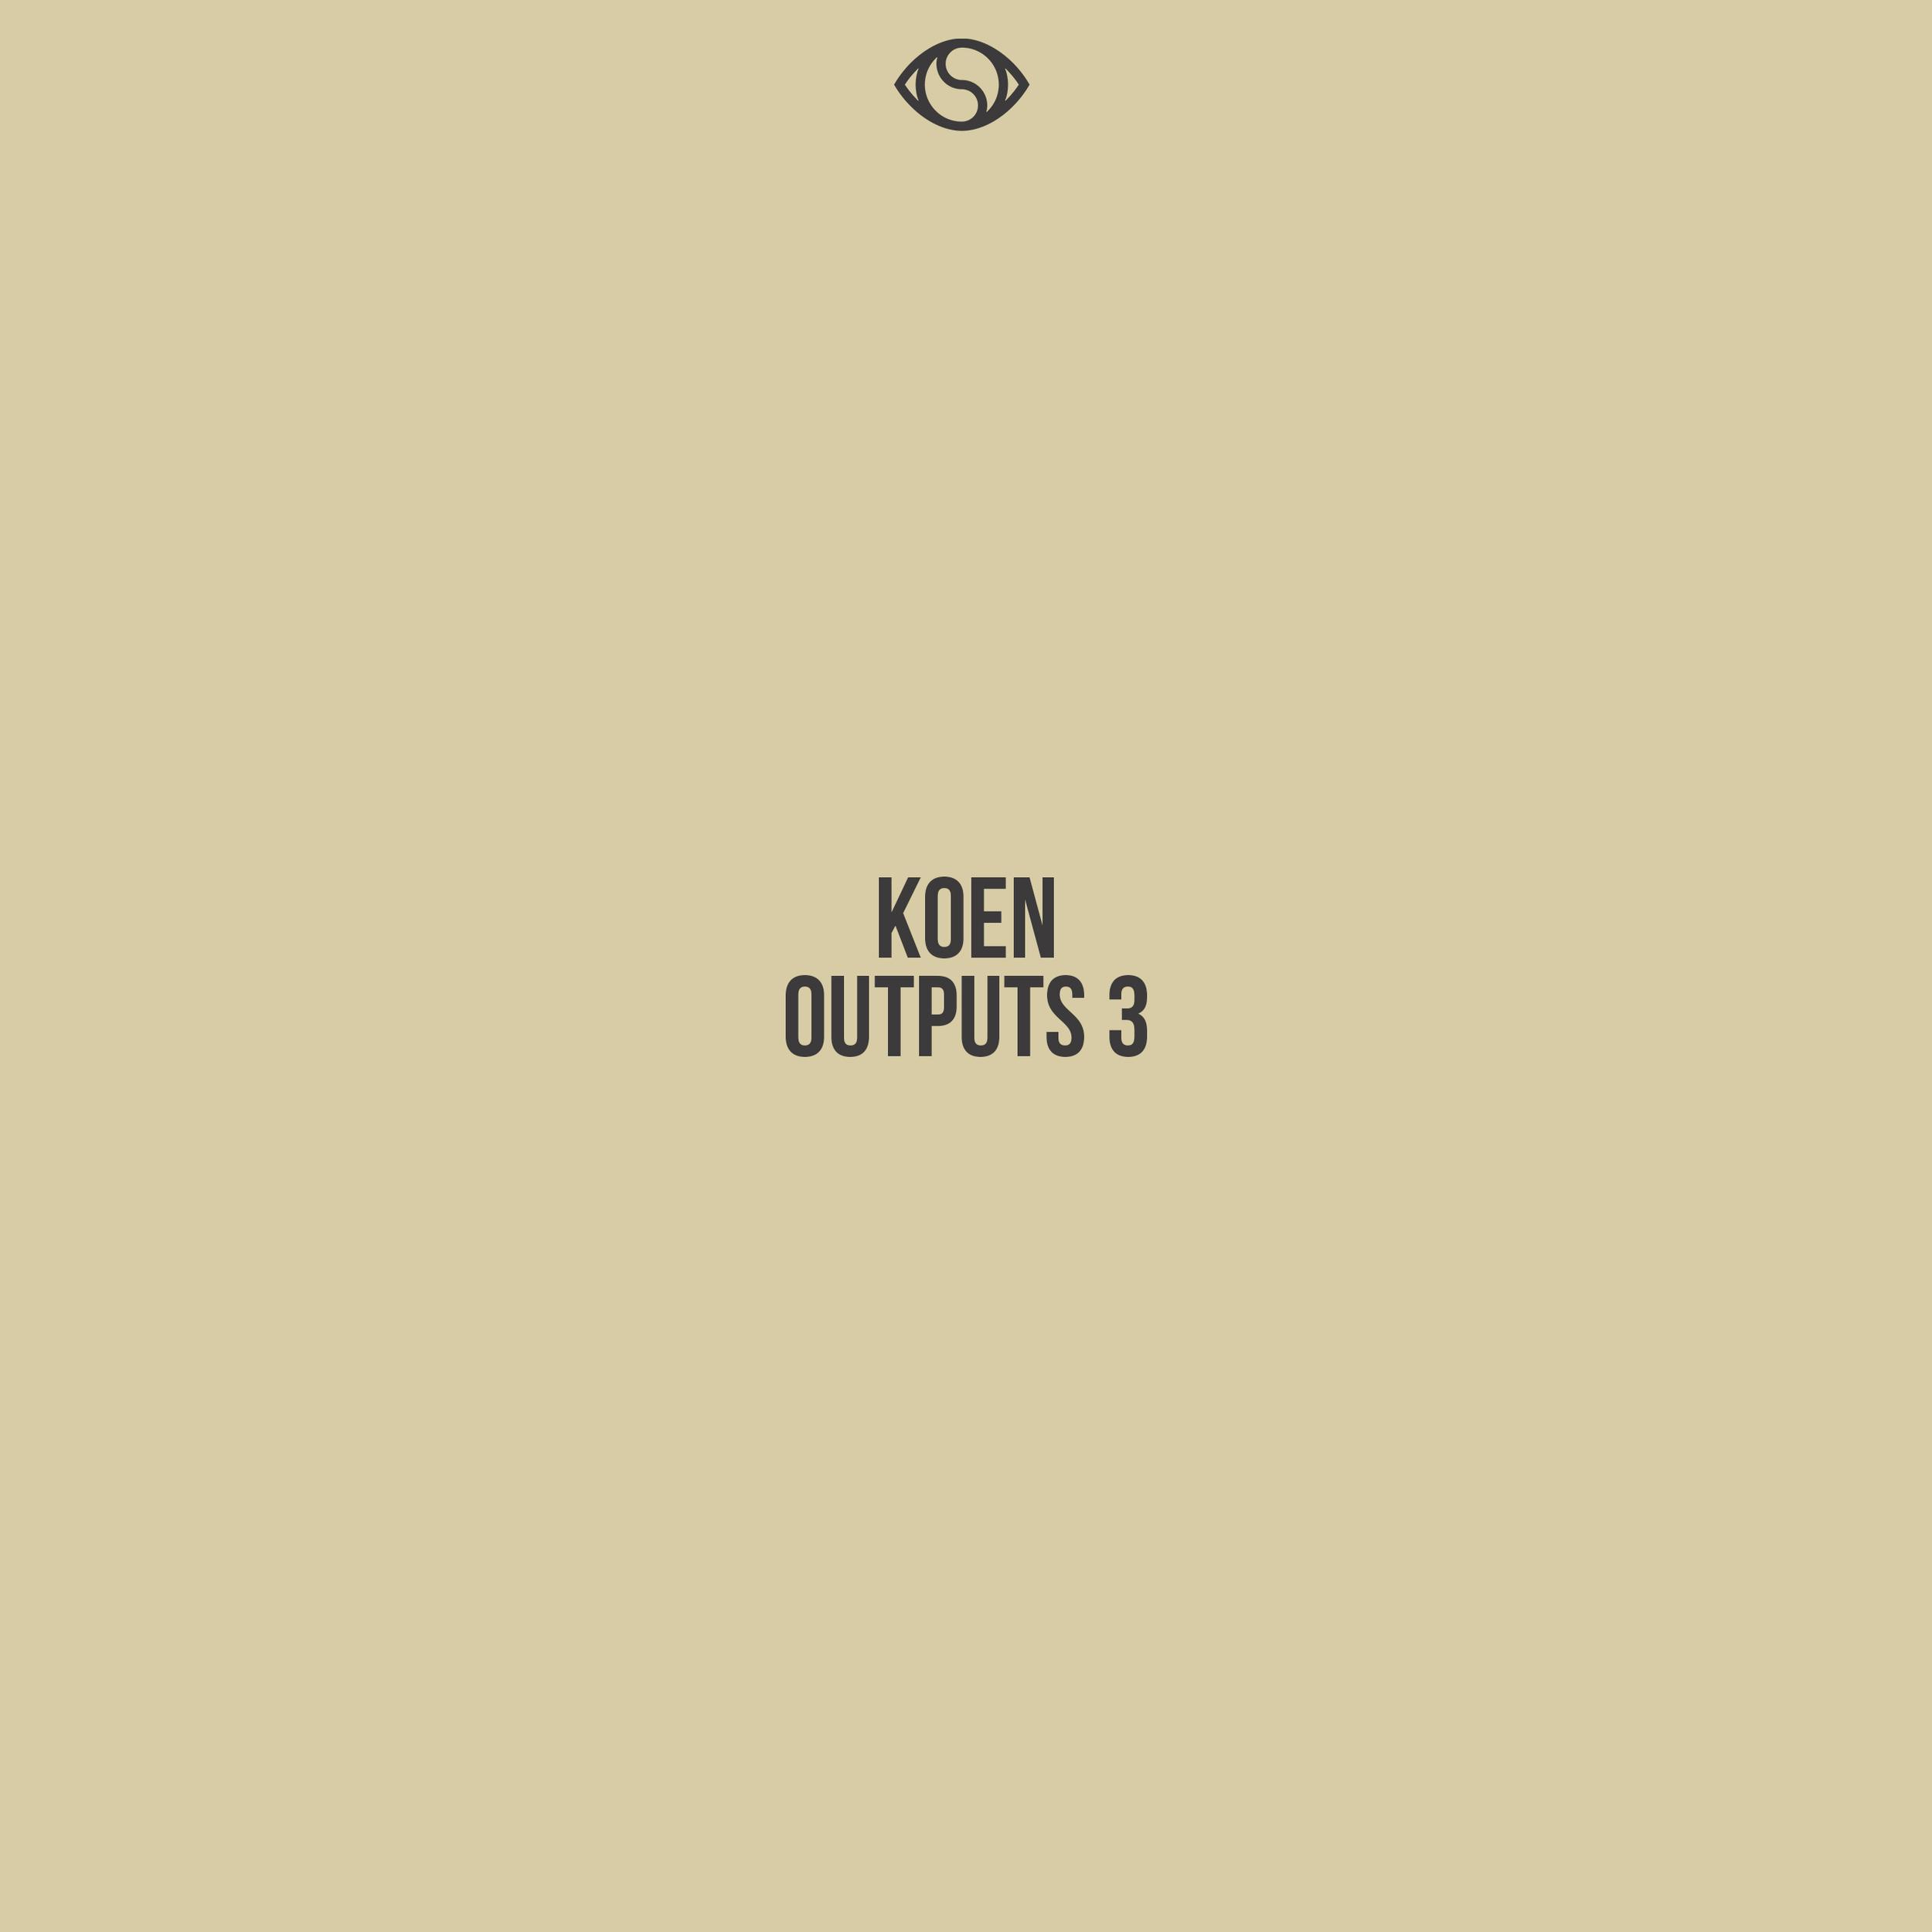 KOEN    OUTPUTS 3